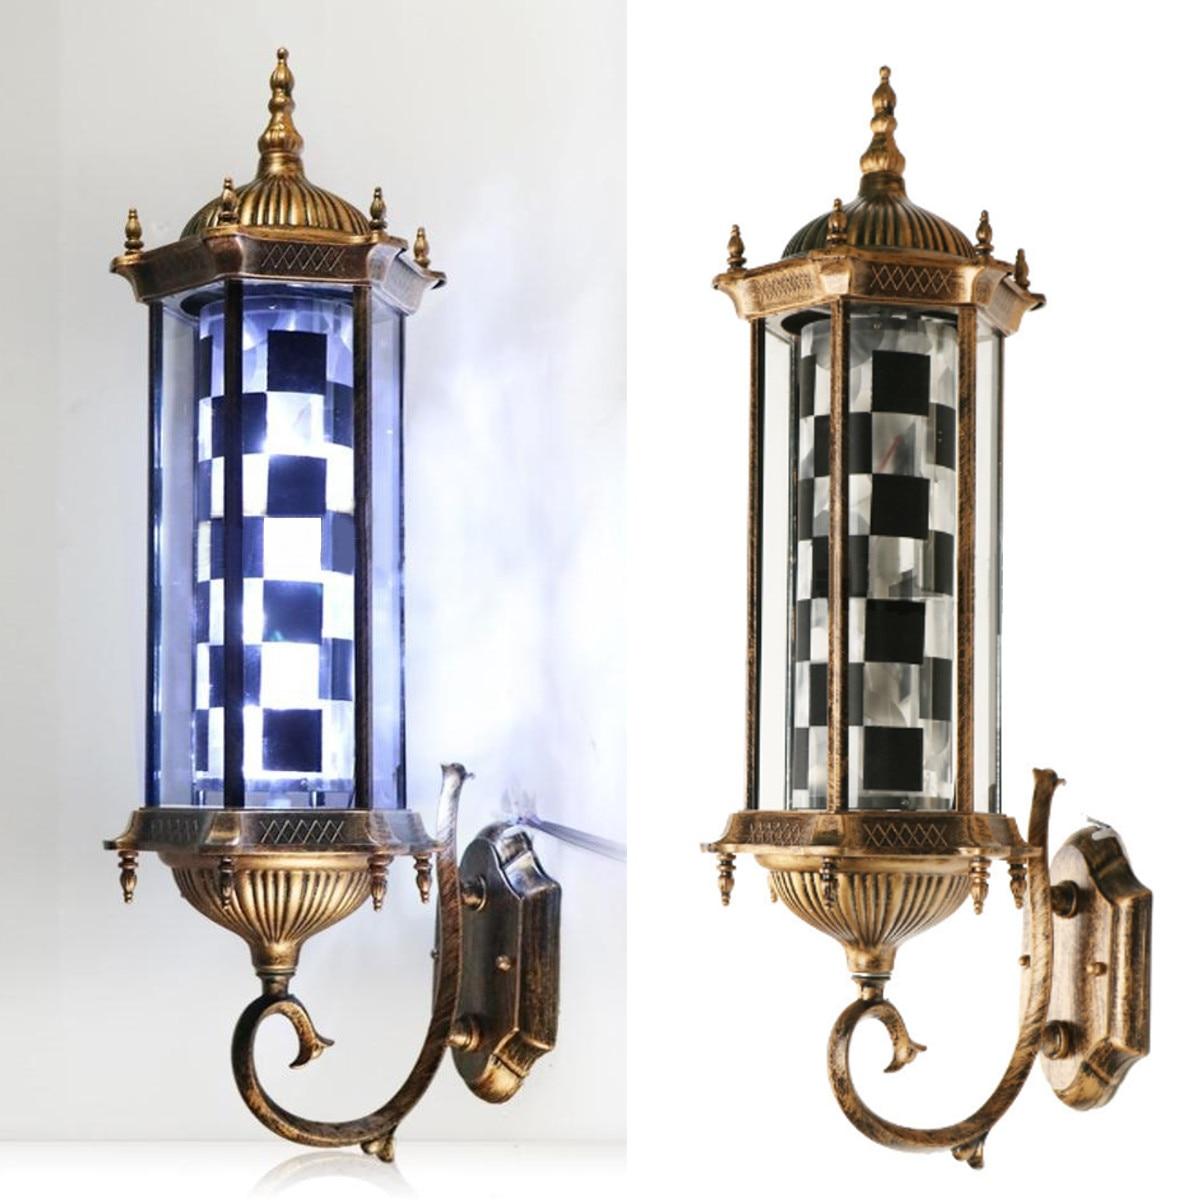 220V LED Barber Shop Sign Pole Light Black White Retro Design Roating Salon Wall Hanging Light Lamp Beauty Salon Lamp New